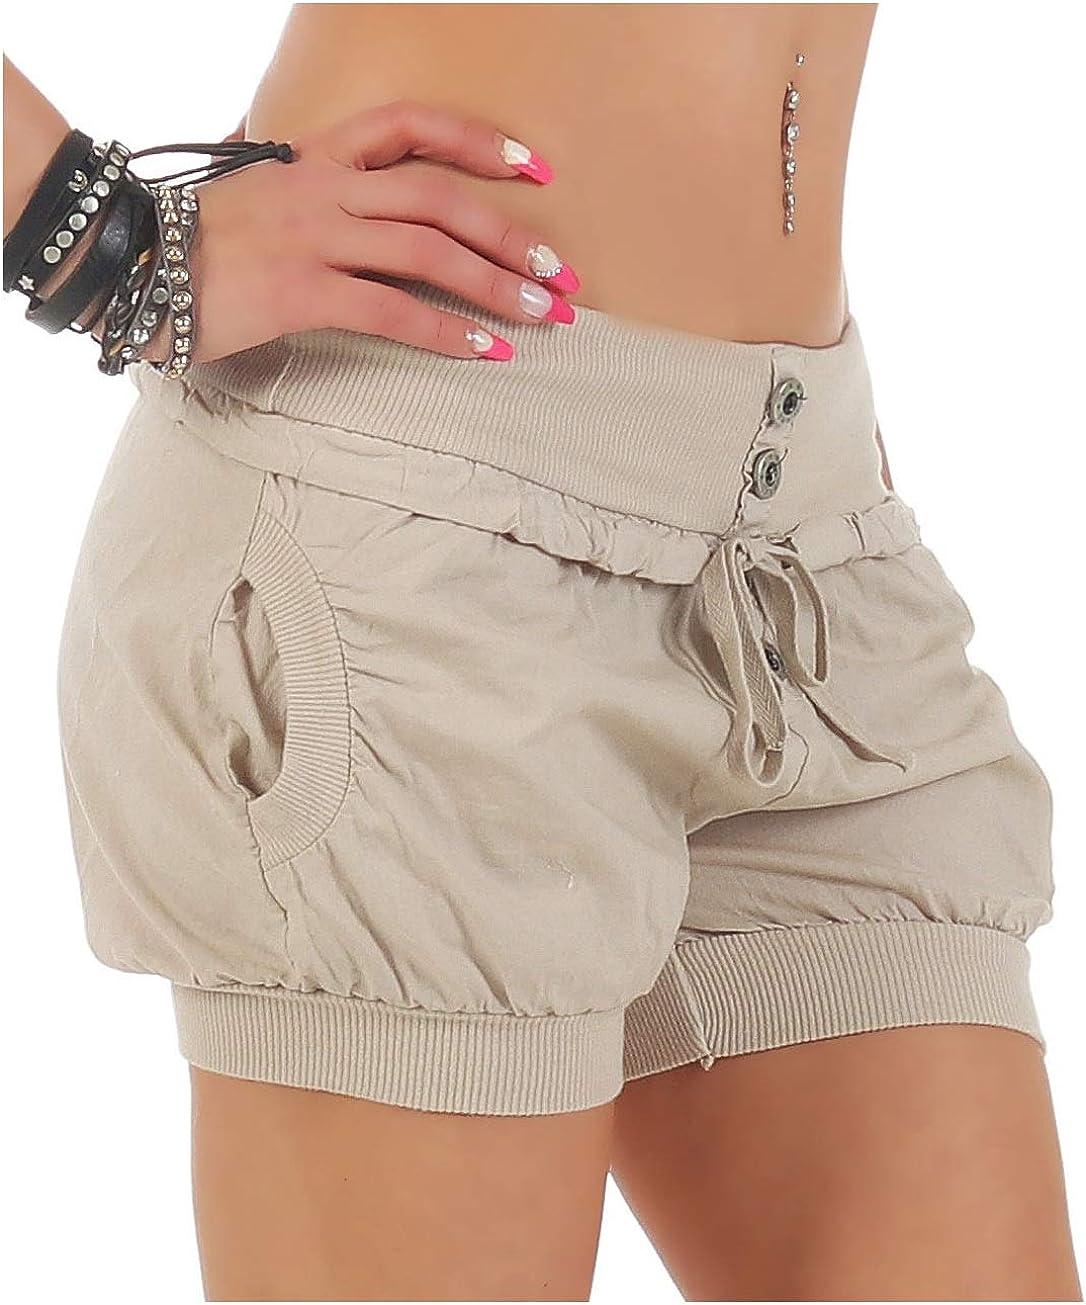 Pants lockere Kurze Hose Shorts klassisch 6086 Bermuda f/ür den Strand Malito Damen Hotpants in Unifarben